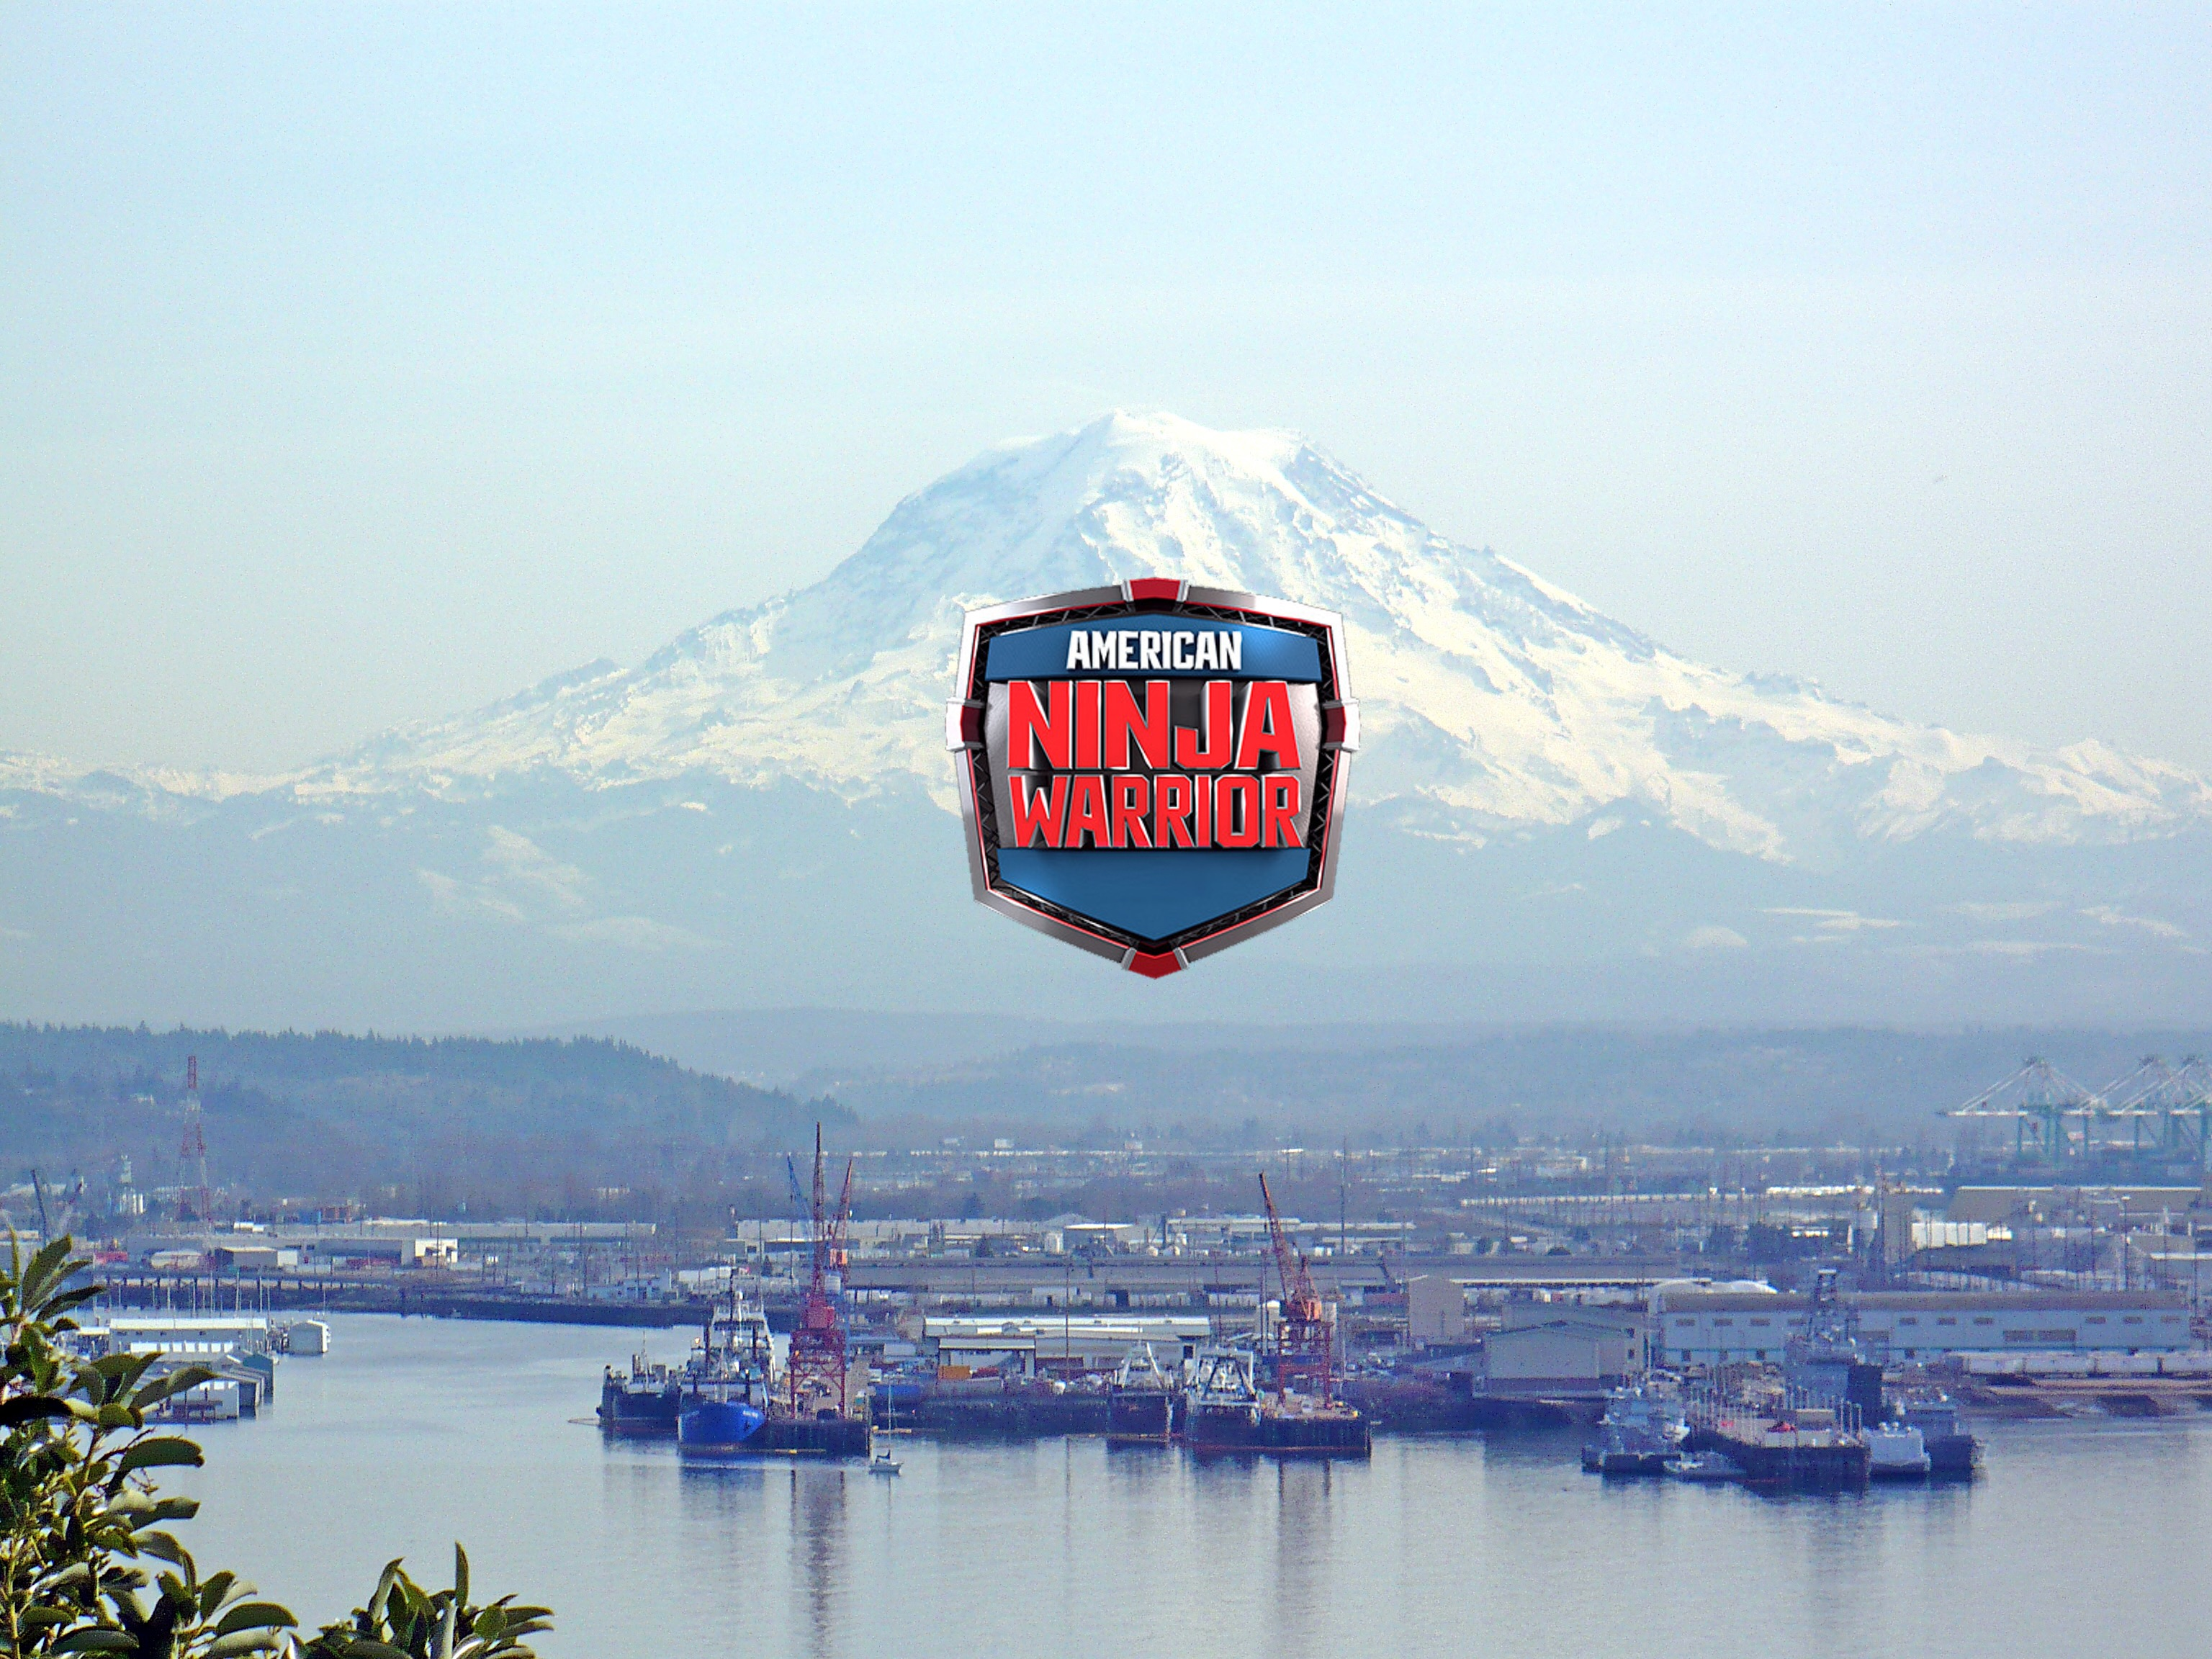 American Ninja Warrior Filming 2021 Season 13 location is Seattle (Tacoma) Washington.  Filming Starts March 26